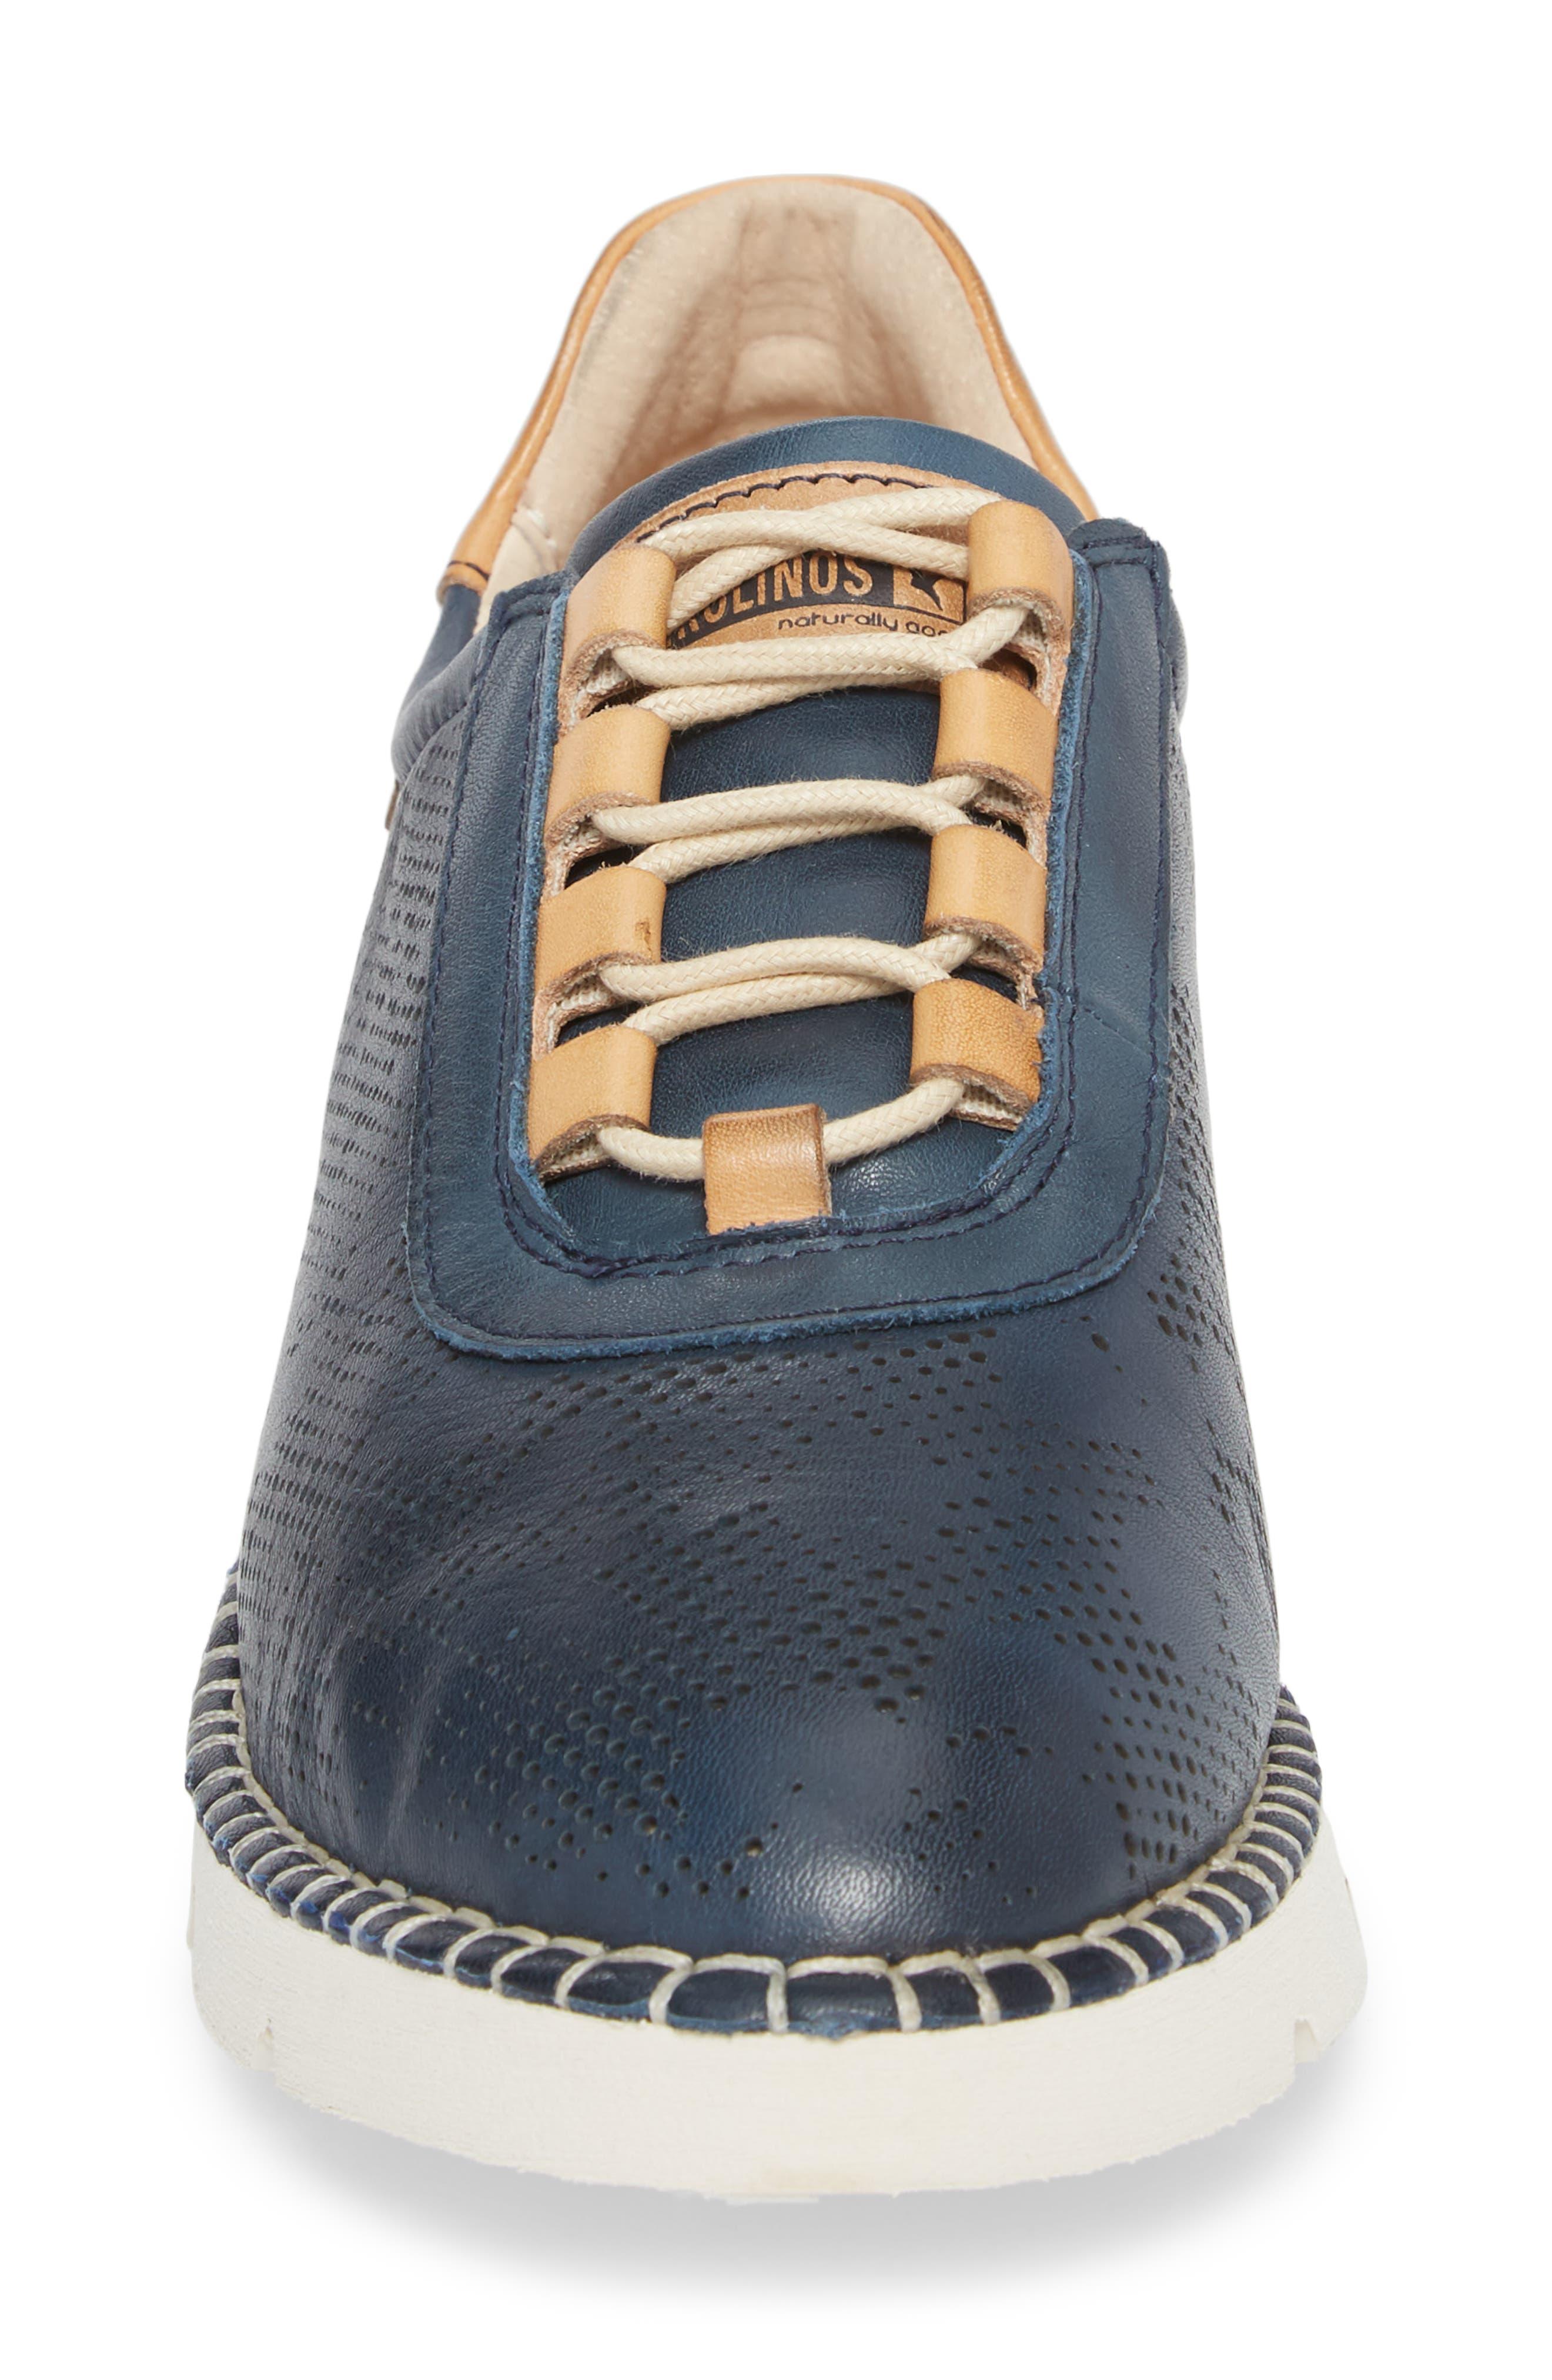 Vera Sneaker,                             Alternate thumbnail 4, color,                             OCEAN LEATHER